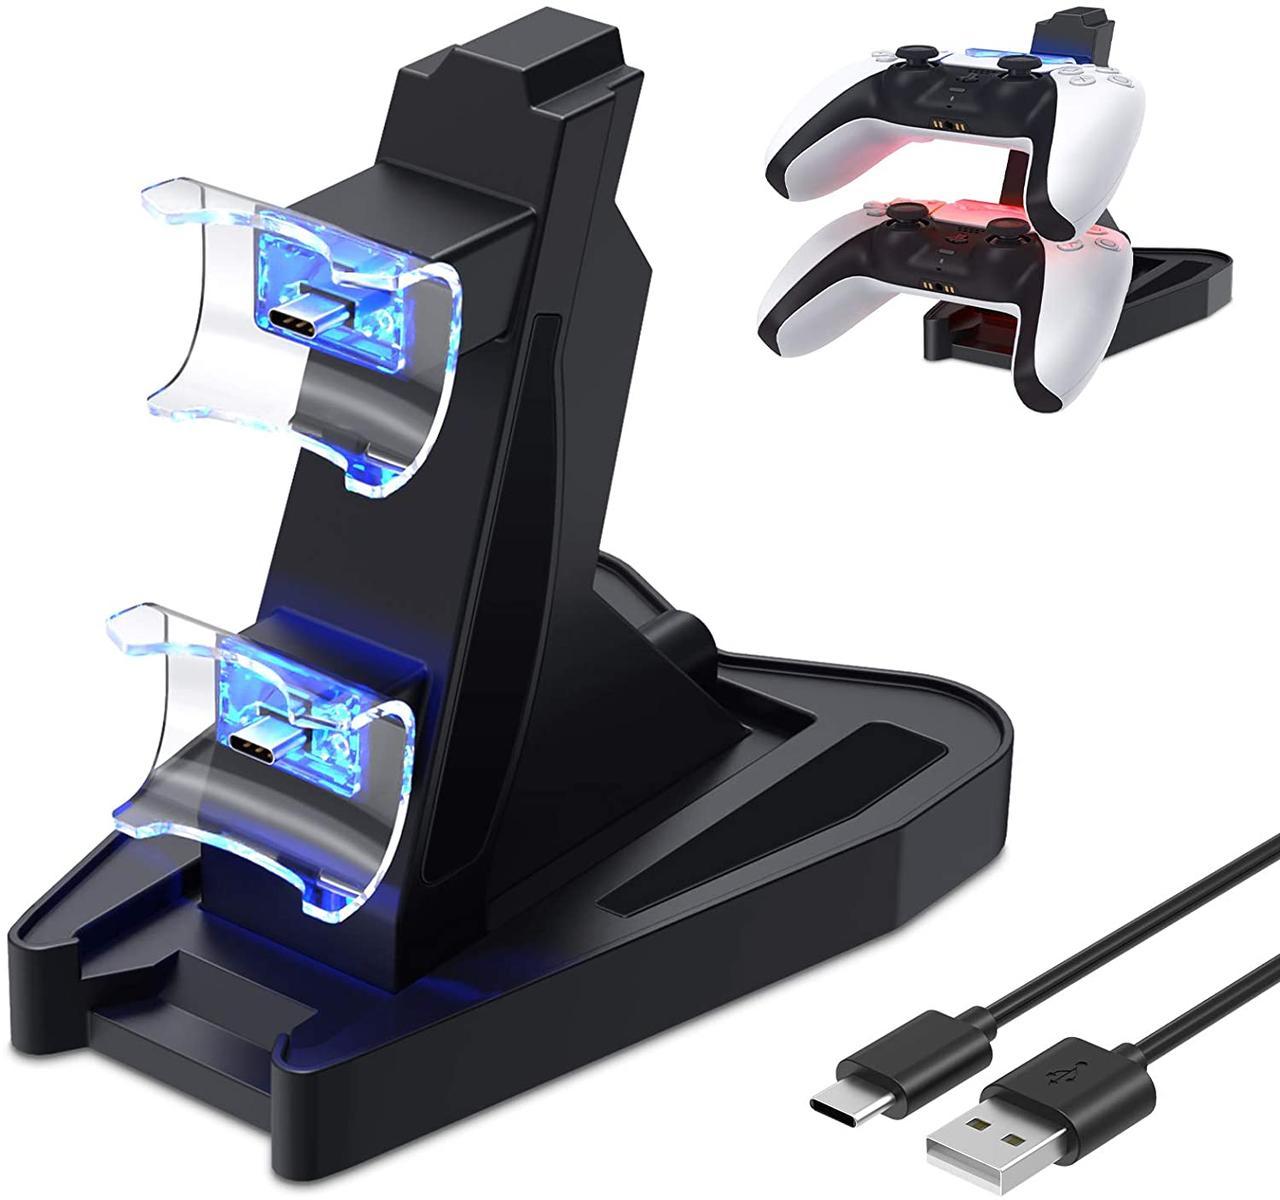 Подставка-зарядка для джостиков PS4. Зарядка для джойстиков Playstation 4.